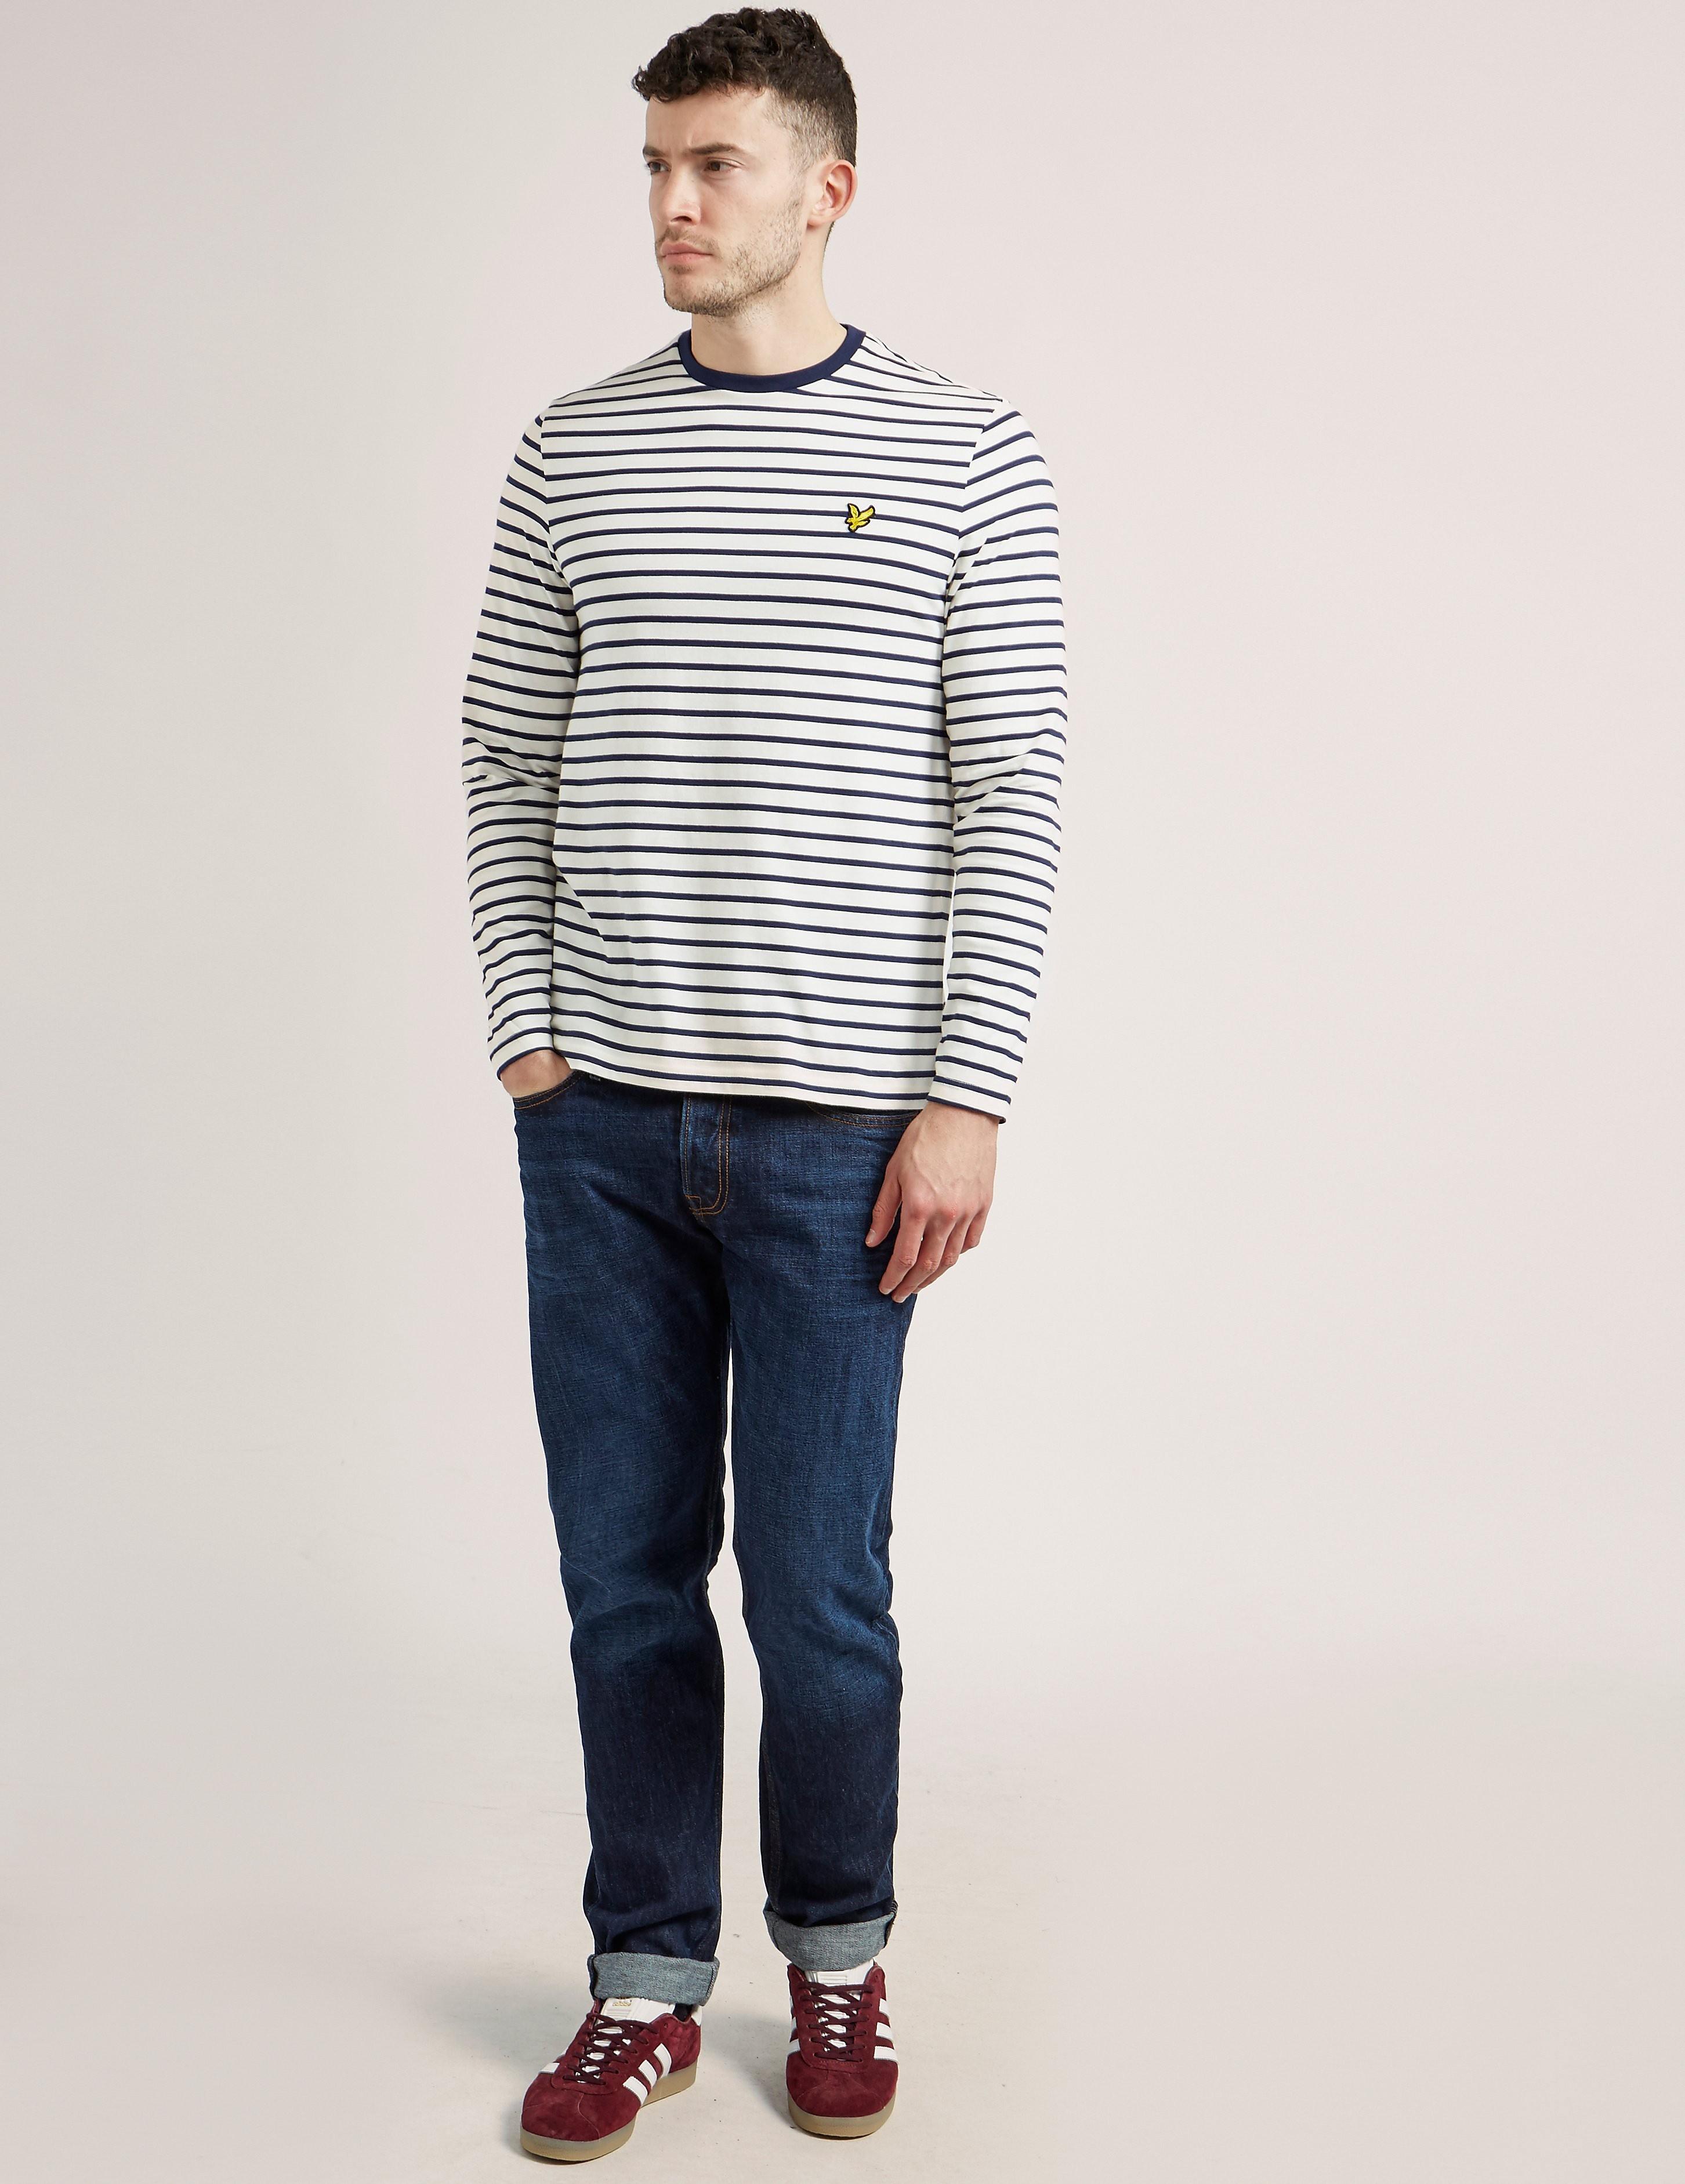 Lyle & Scott Brenton Stripe Long Sleeve T-Shirt